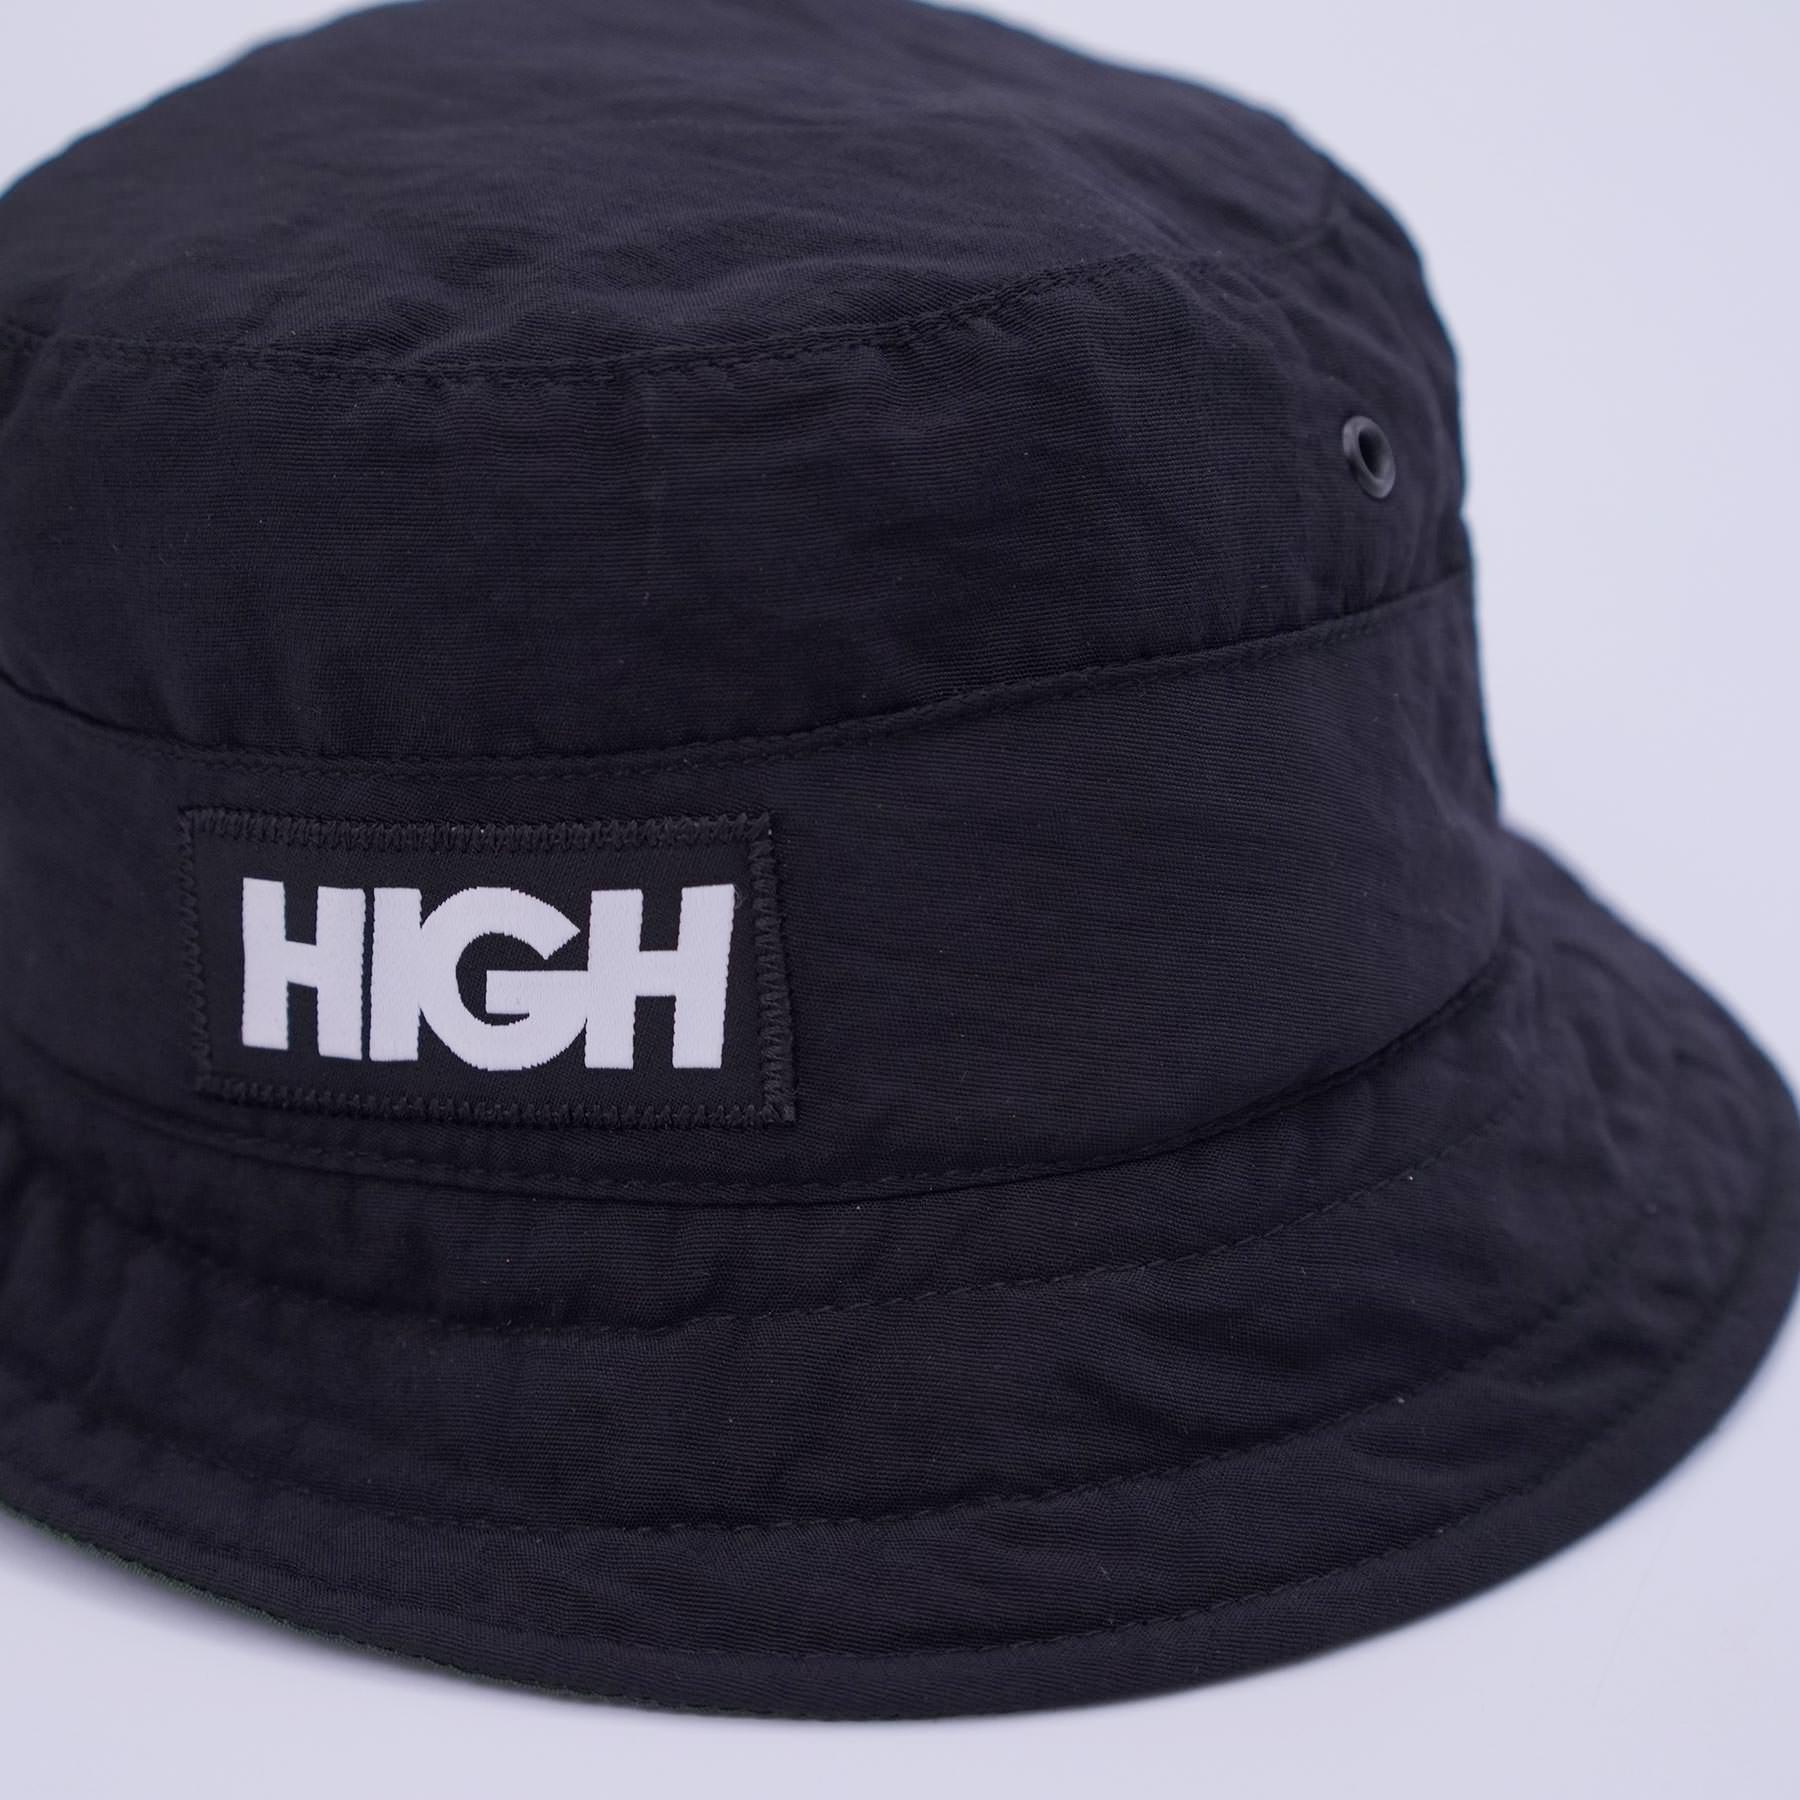 Black_Reversible_Bucket_Hat_Logo_Black_Green